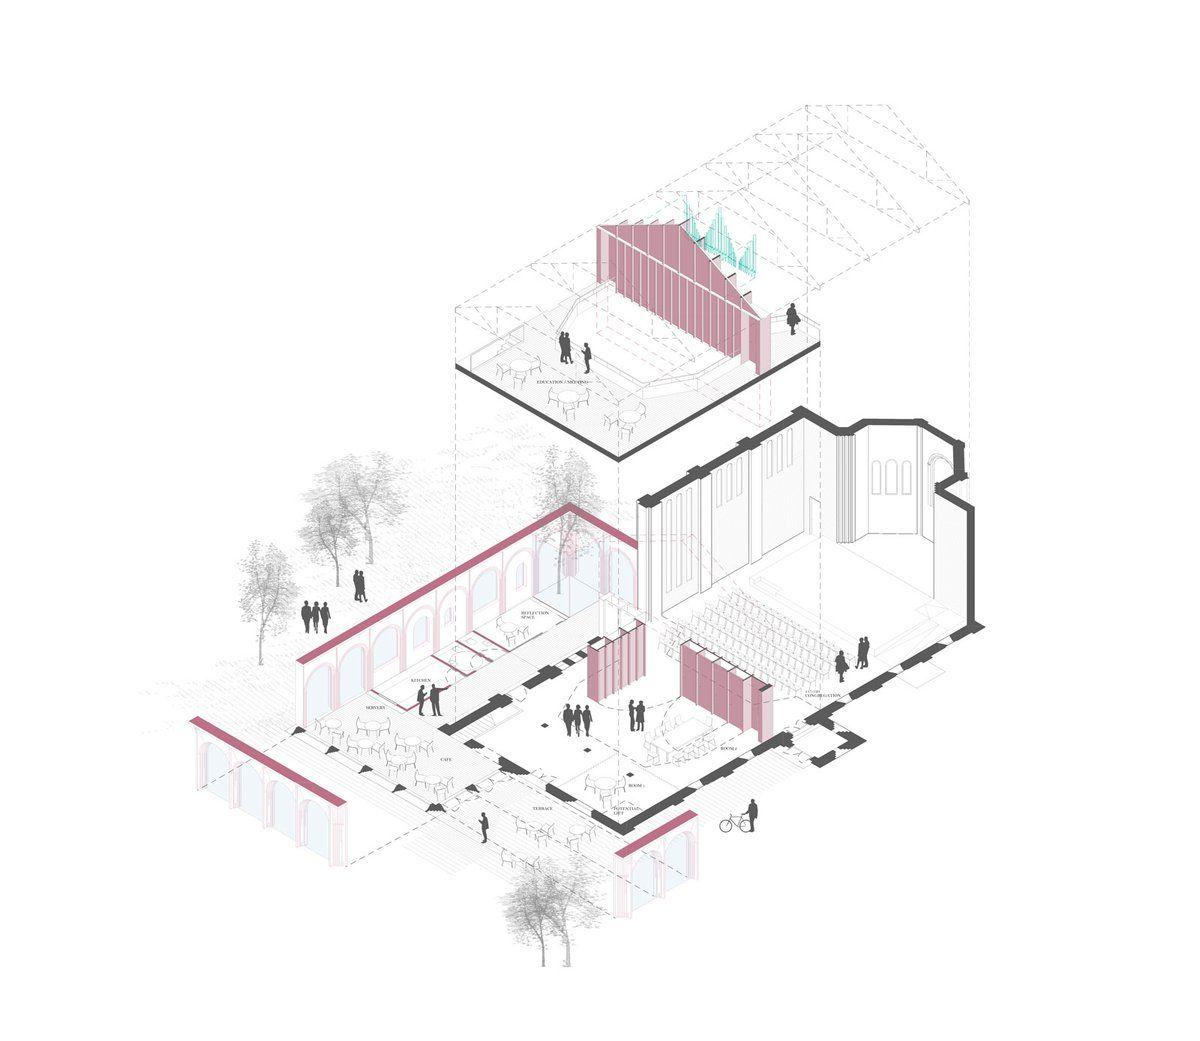 Pin By Irene Gonzalez Fernandez On Architectural